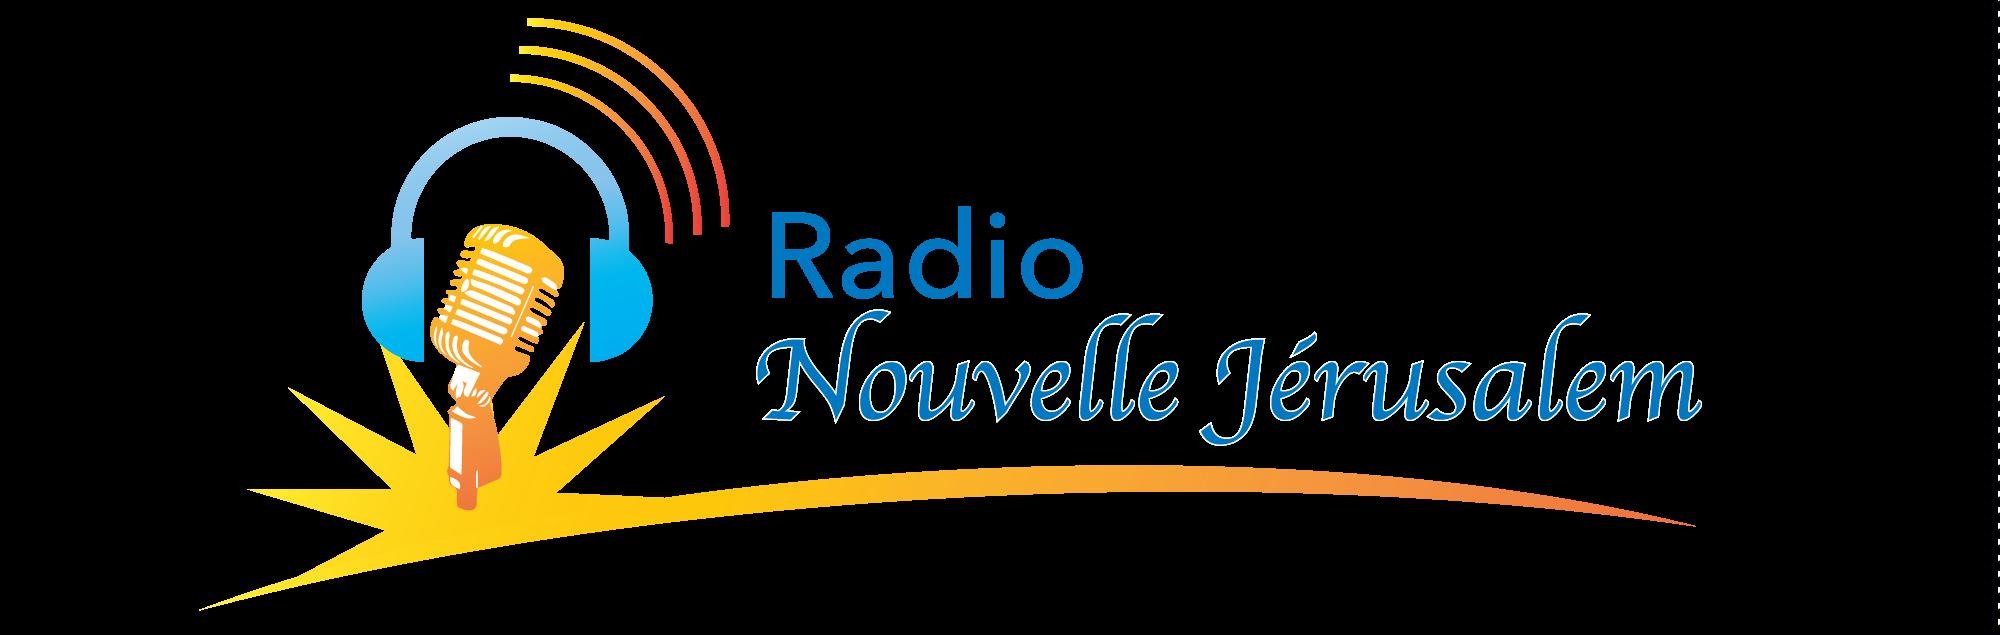 Radio nouvelle Jérusalem